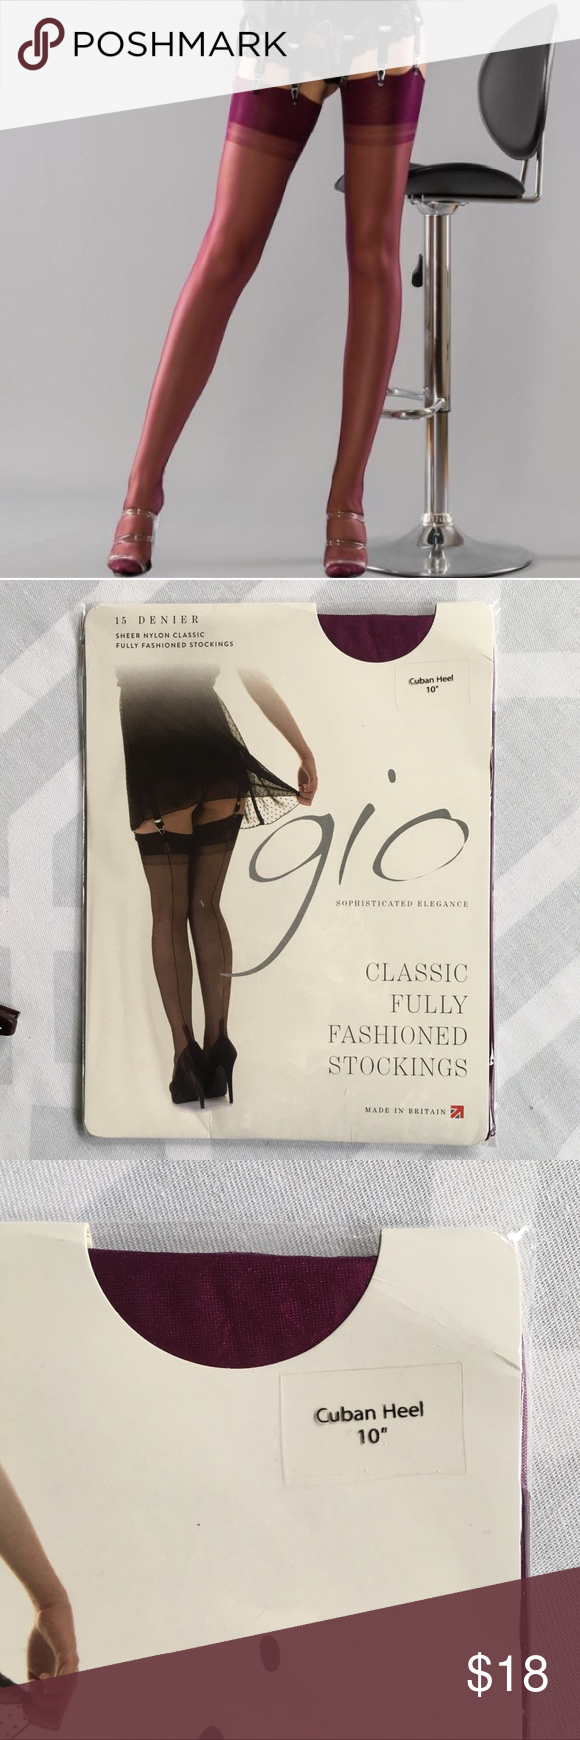 c09583a146b GIO Cuban Heel Contrast Seam Stockings GIO Purple Cuban Heel Contrast Seam  Thigh High Stockings.